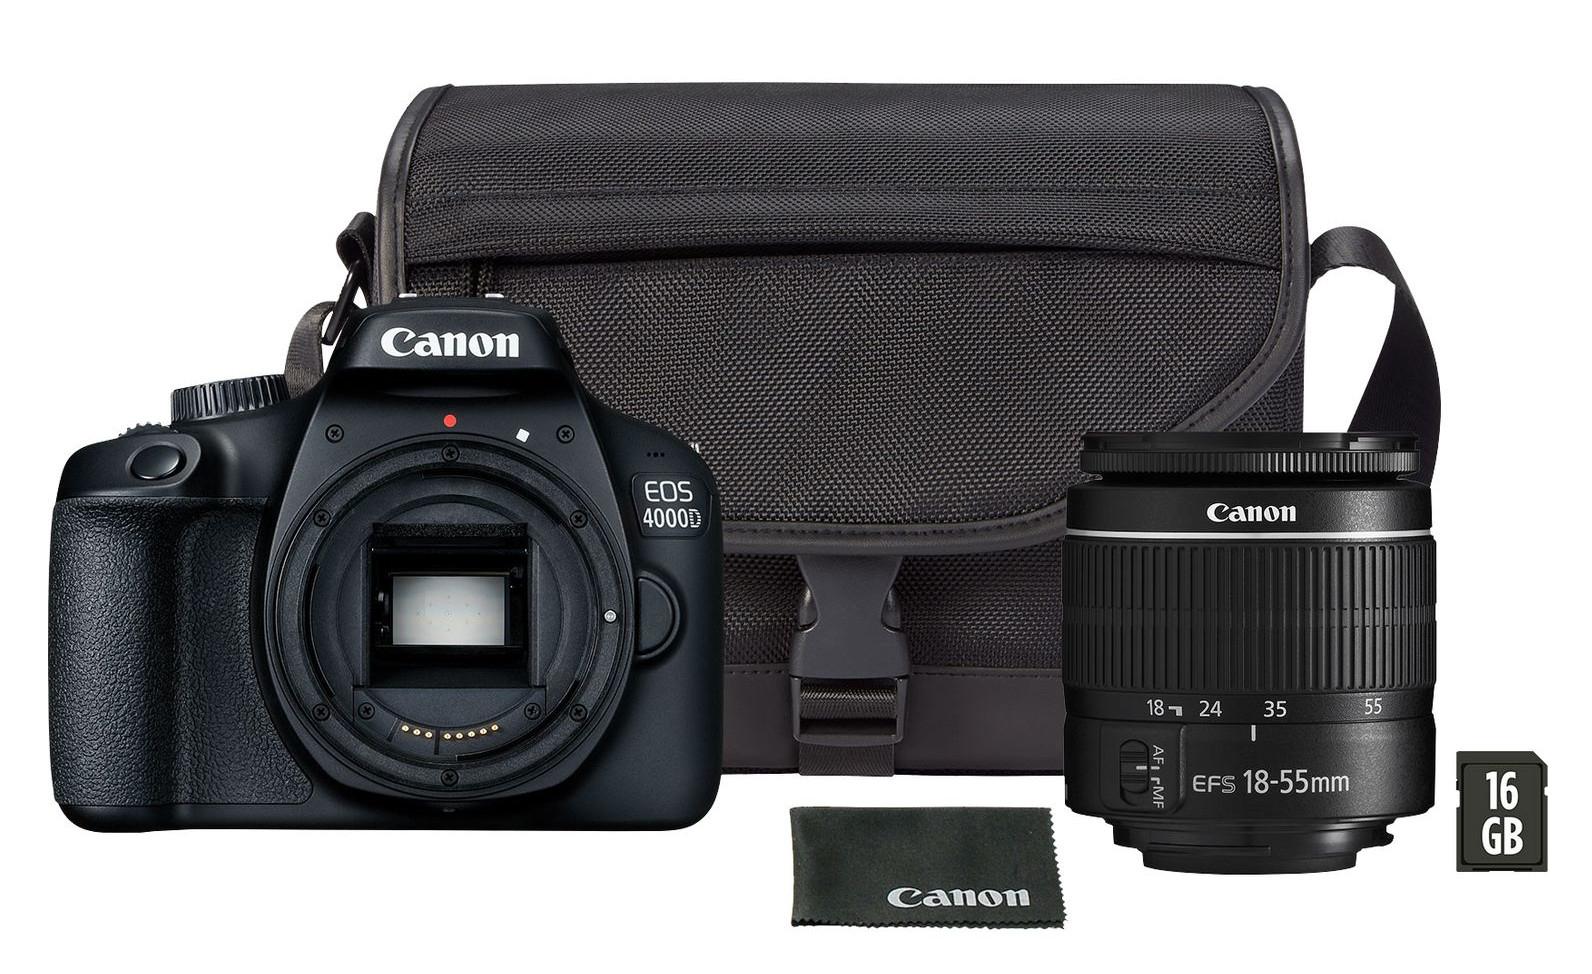 Canon EOS 4000D DSLR Camera EF-S 18-55mm Lens, Bag + 16GB card Bundle for £239.98 @ Costco (+2 yrs warranty)